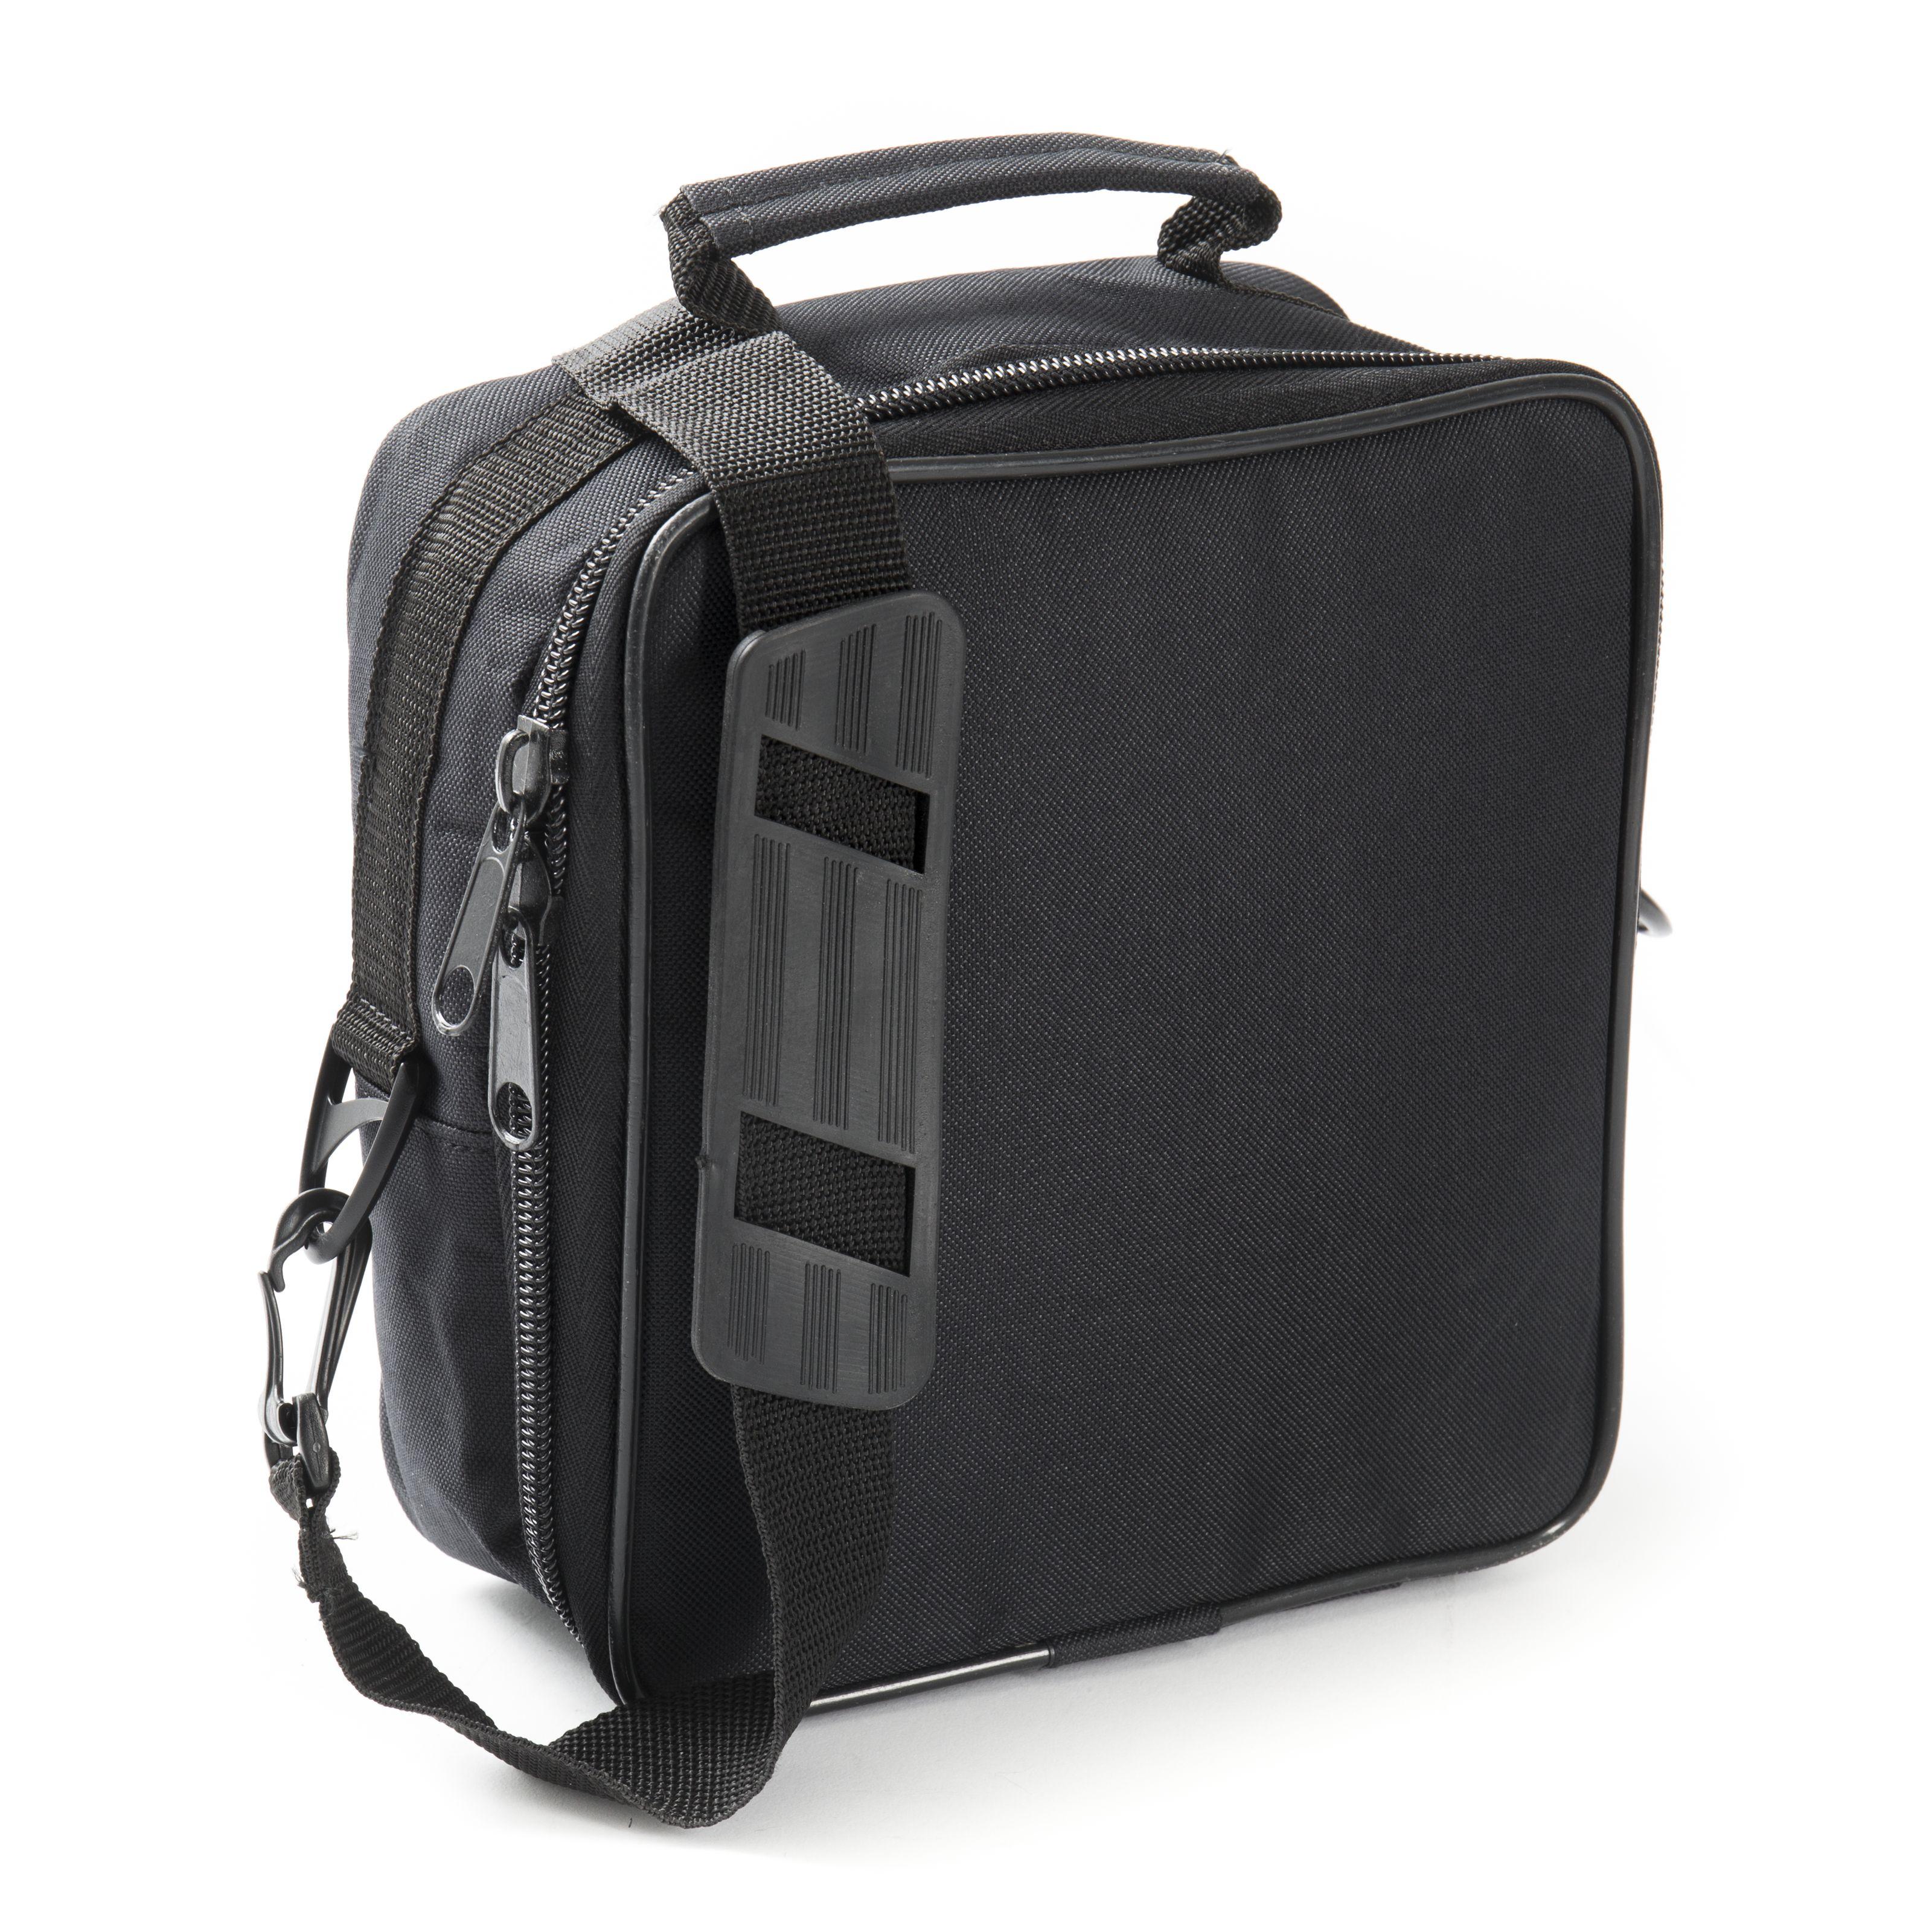 MUSIC STORE - DJ Headphone Bag